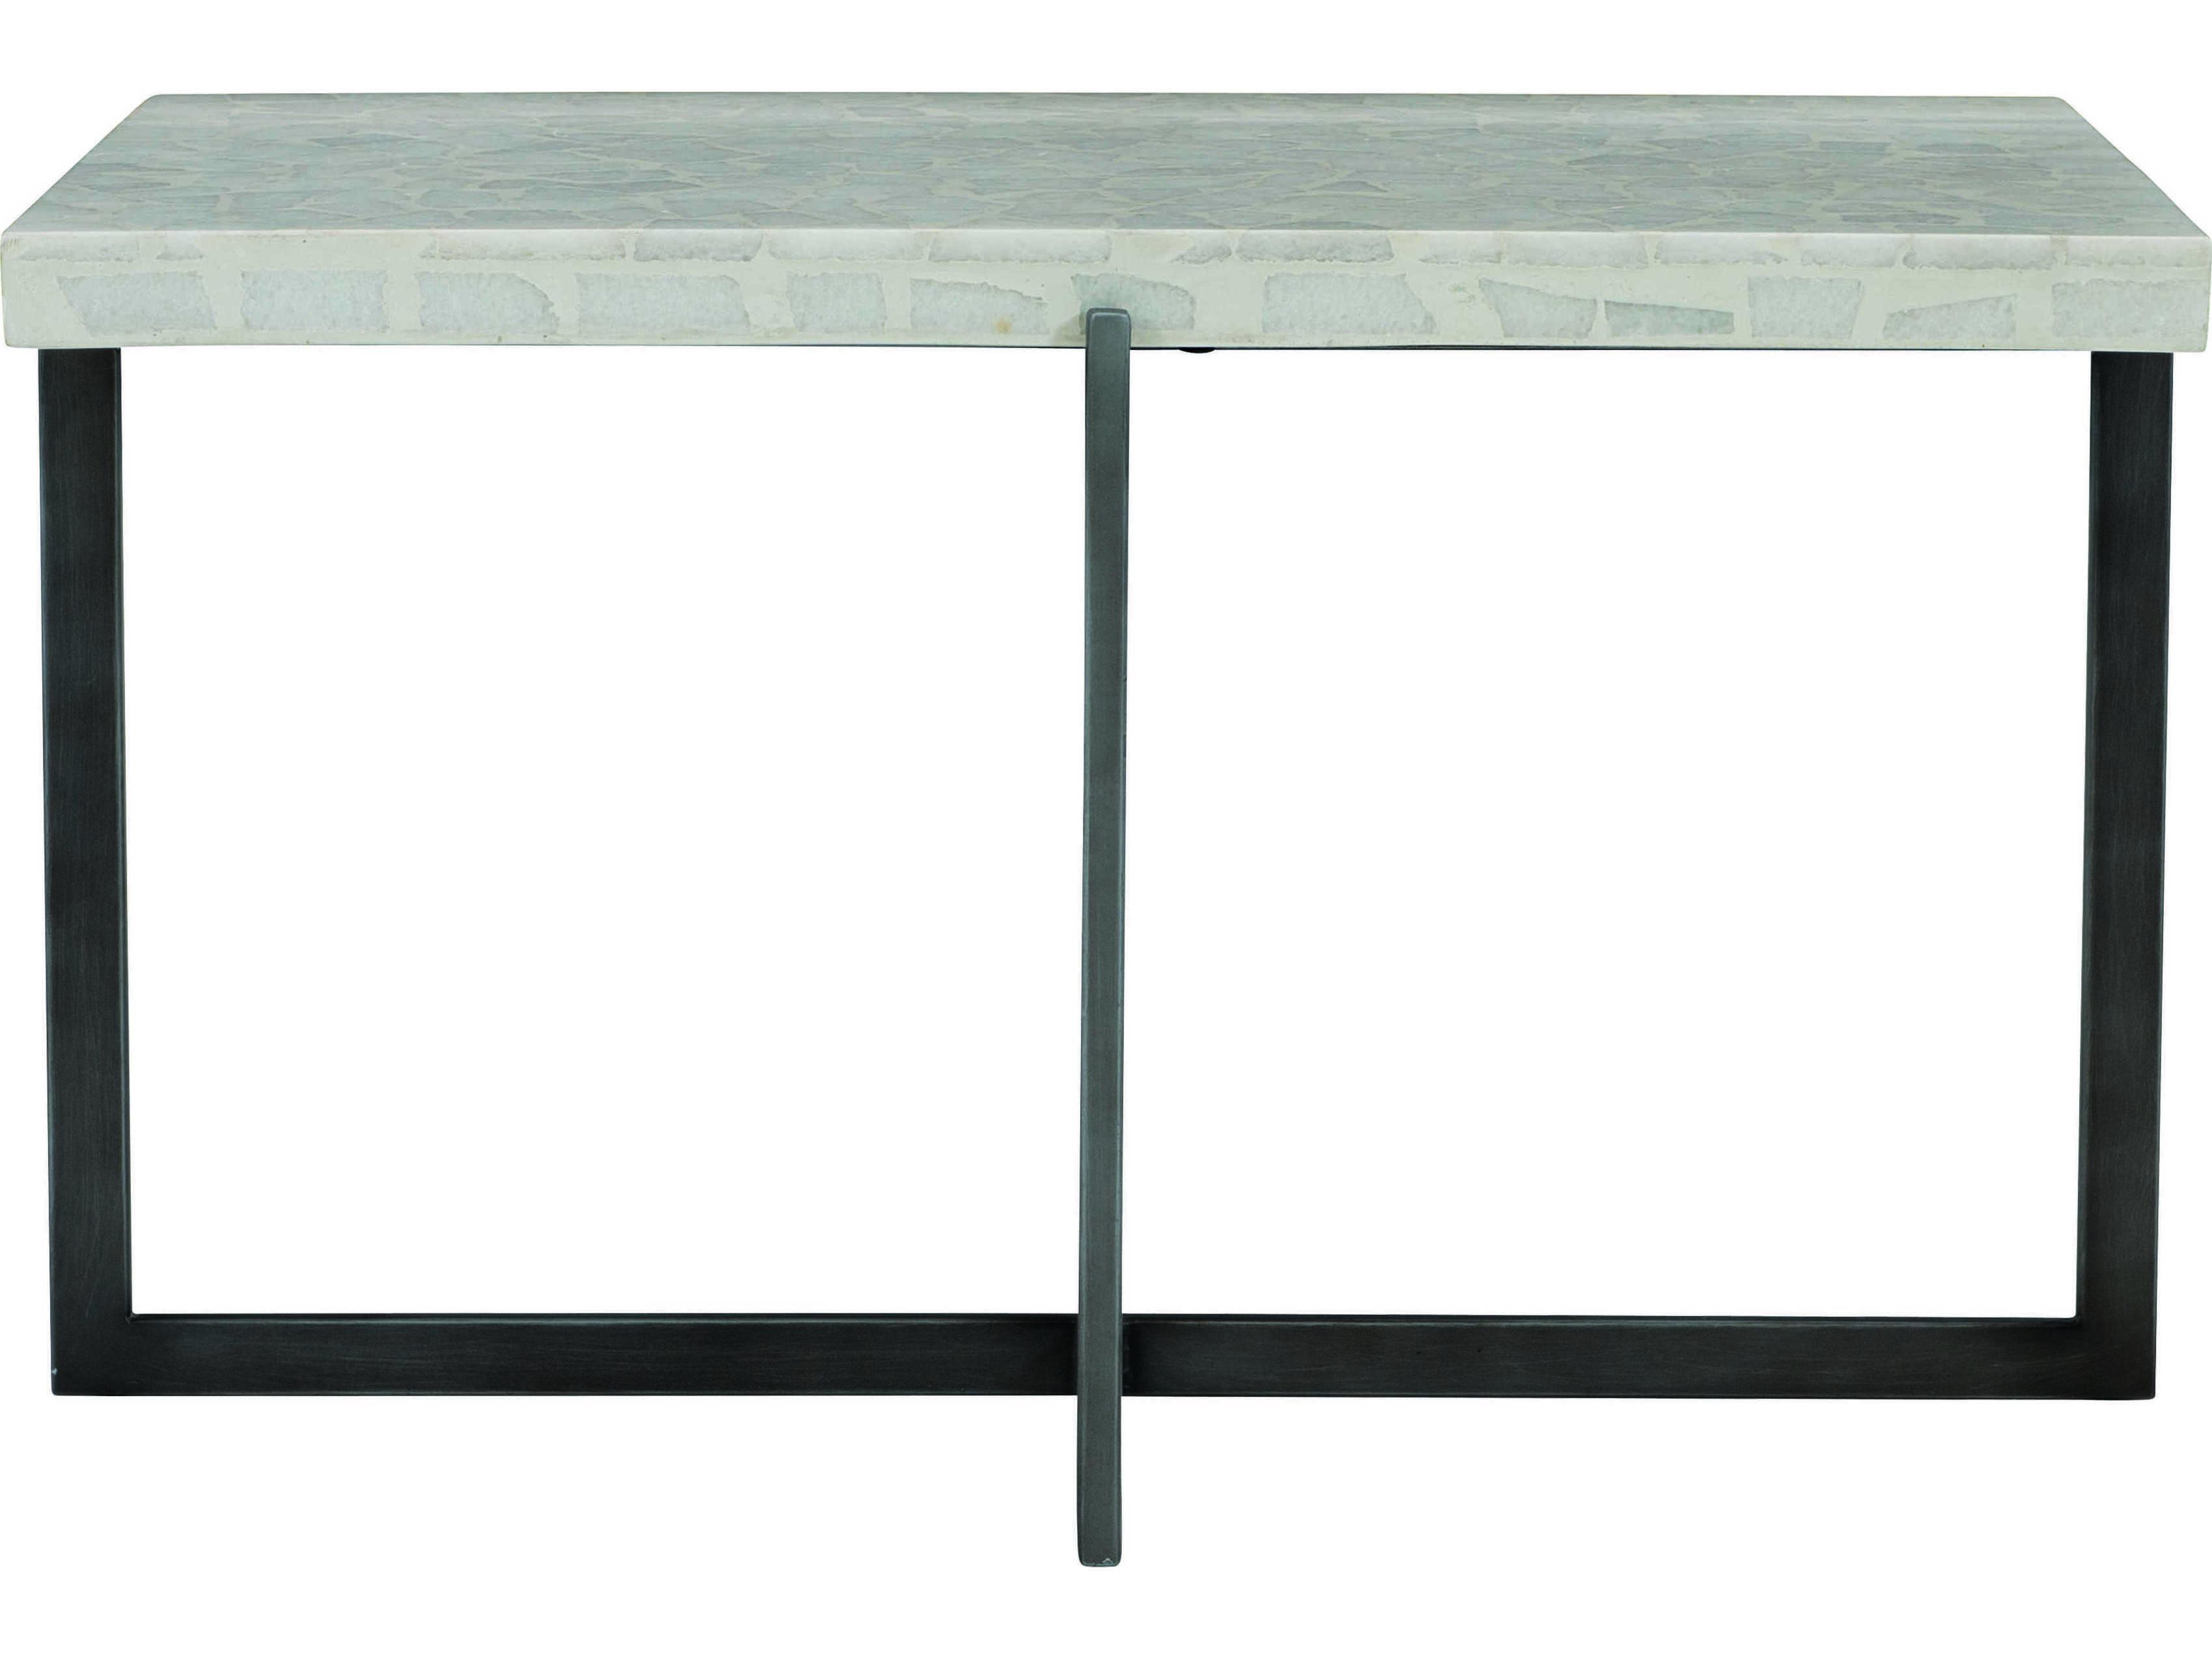 Bernhardt Exteriors Flint Gray Terrazzo 31 Wide Rectangular Faux Stone Steel Stillwater Coffee Table Bhex01010